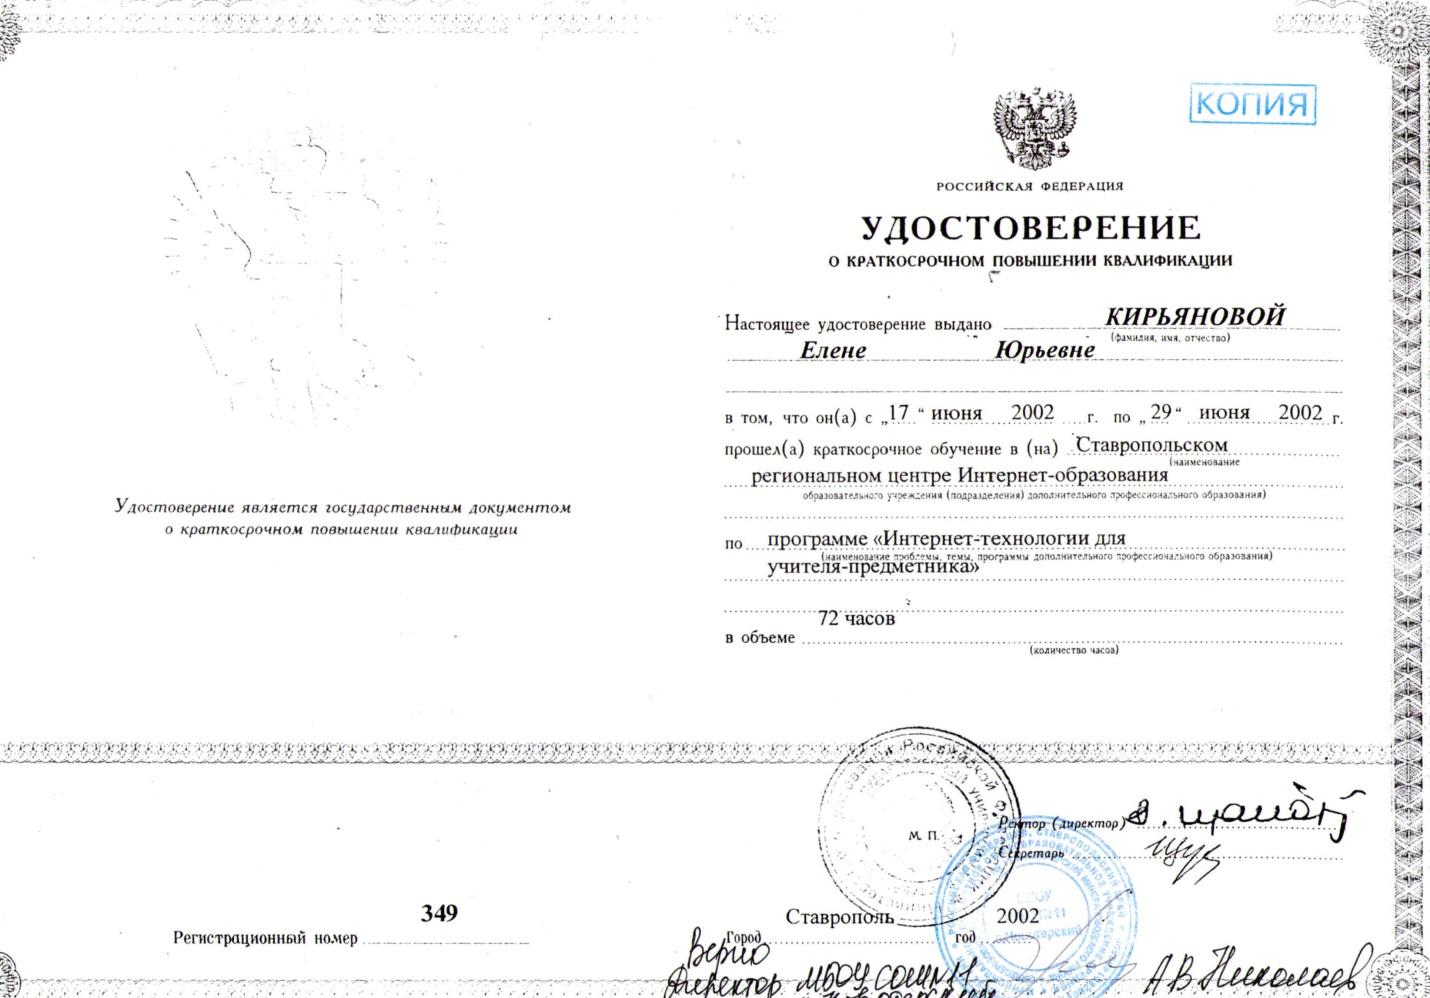 C:\Users\Сергей\Desktop\моя аттестация 2016\Document_40.jpg